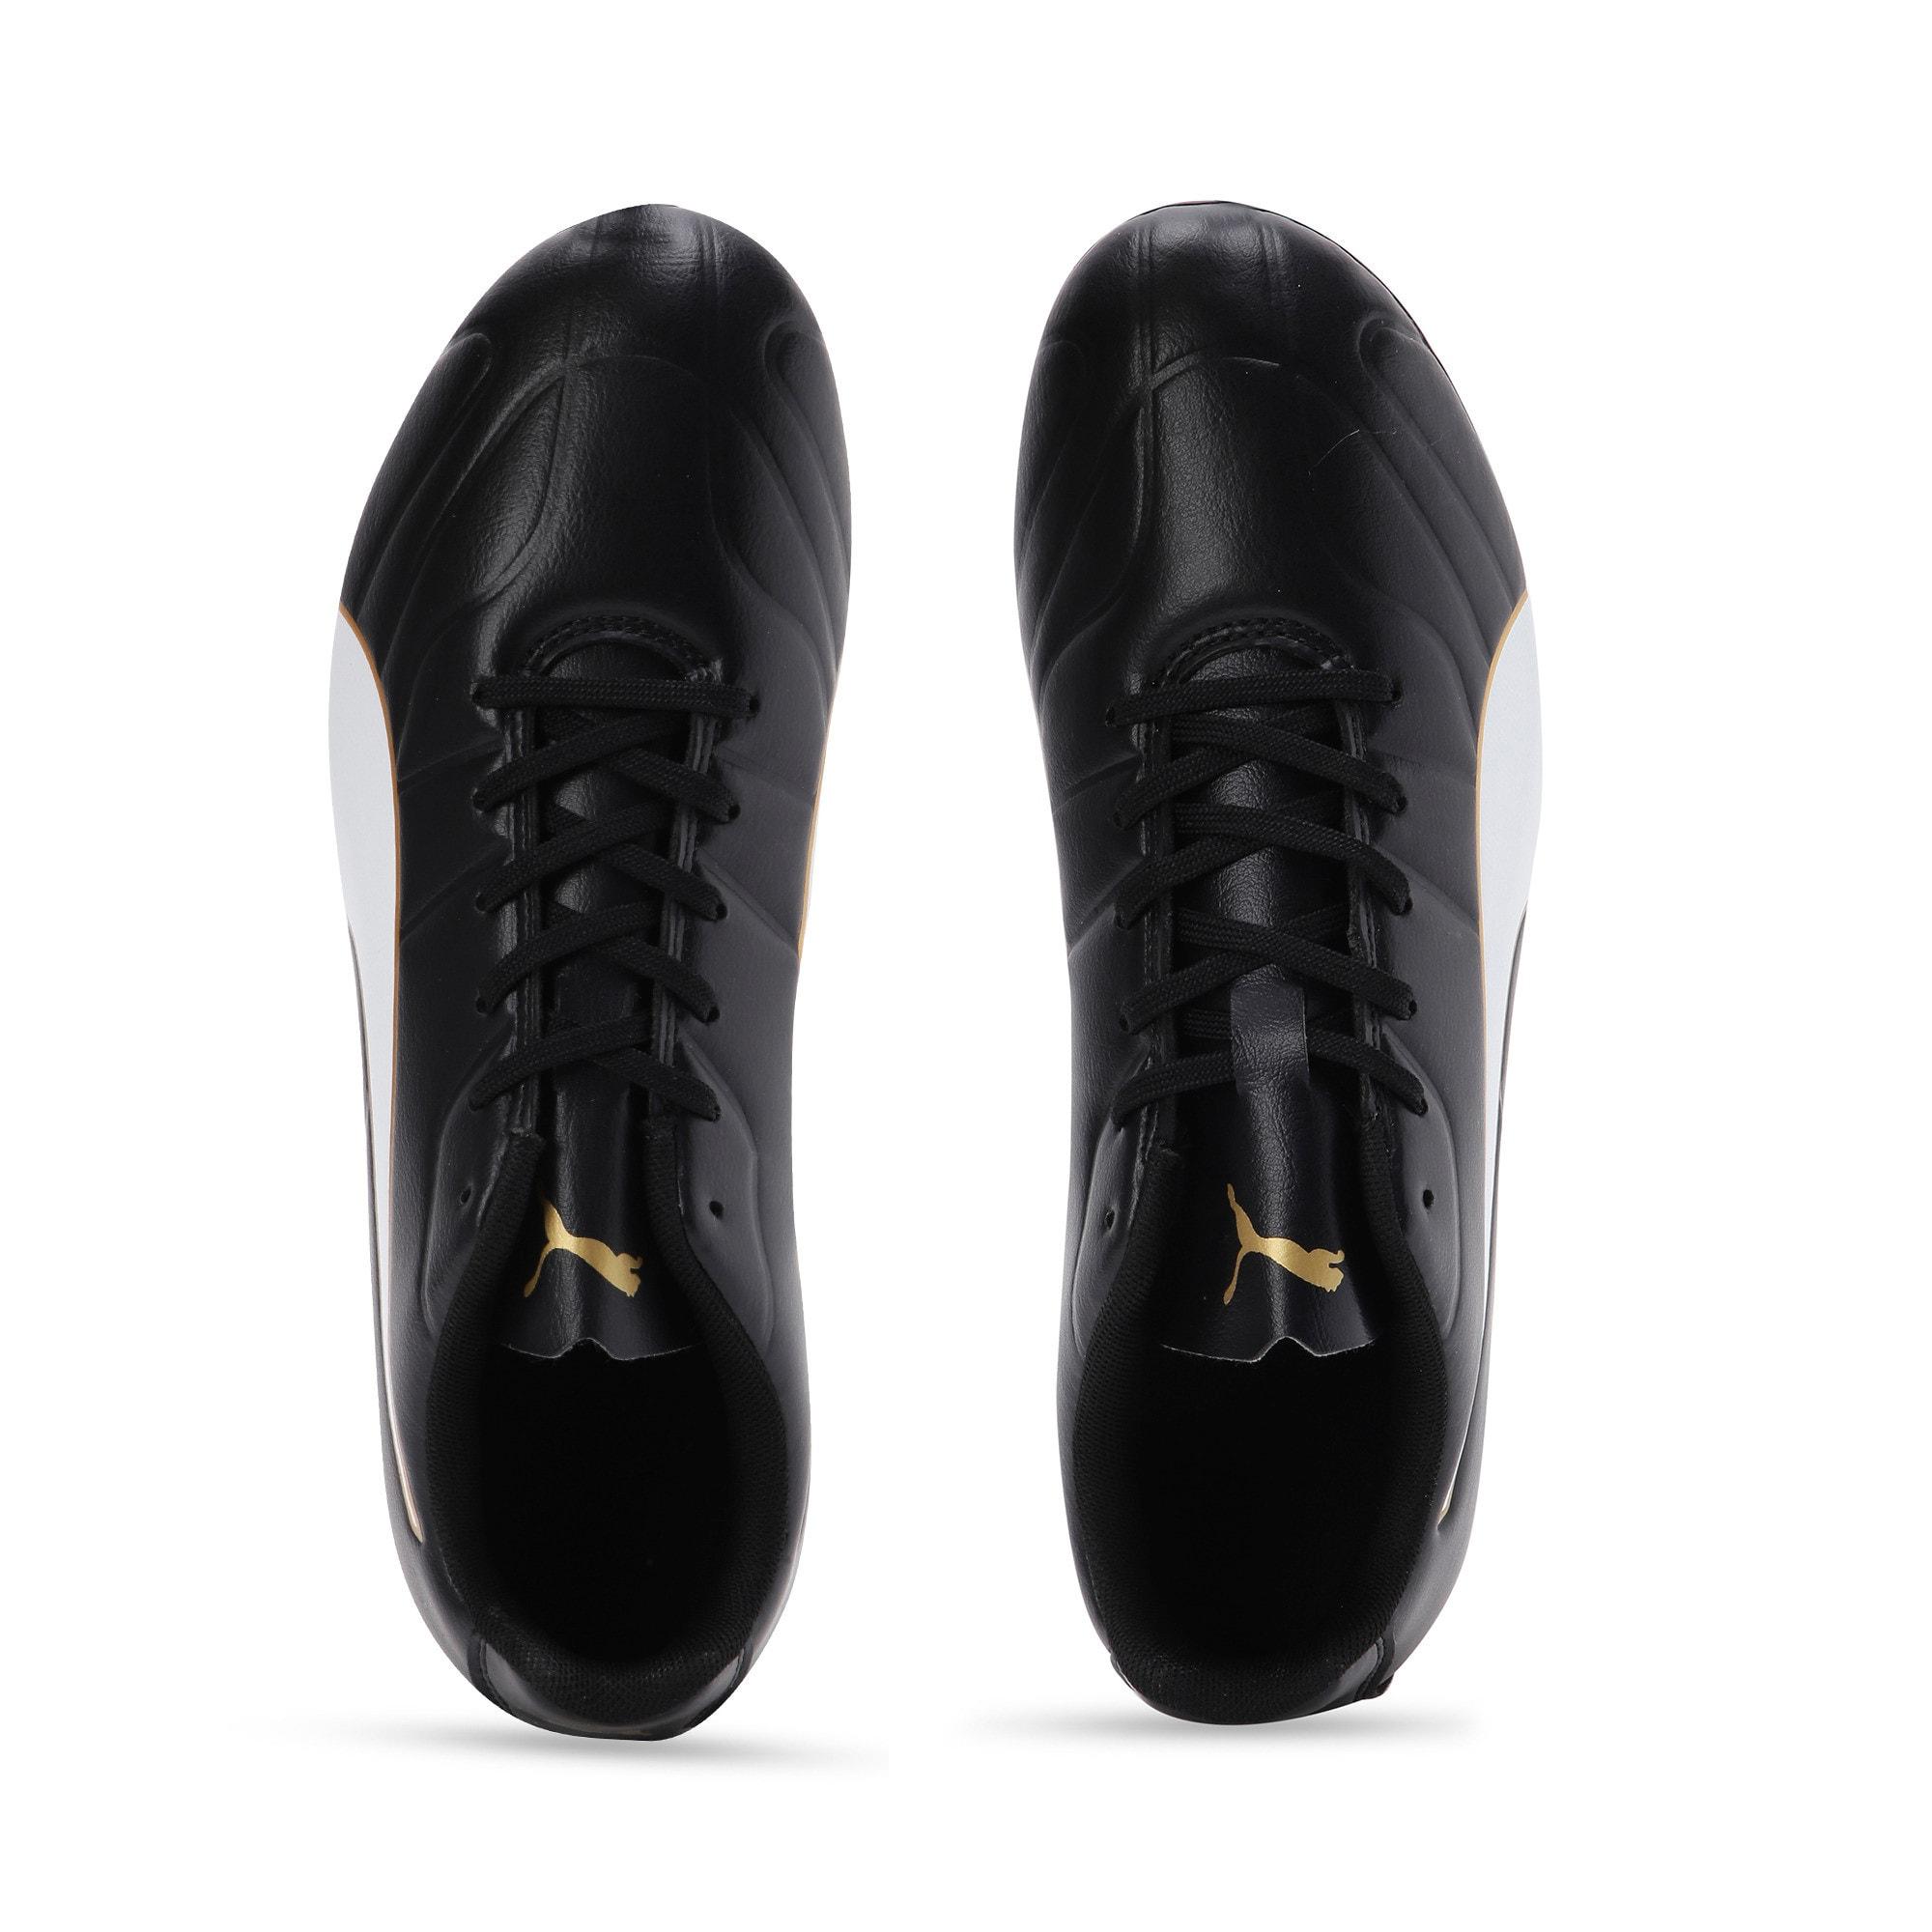 Thumbnail 4 of Classico C II FG Men's Football Boots, Black-White-Gold, medium-IND